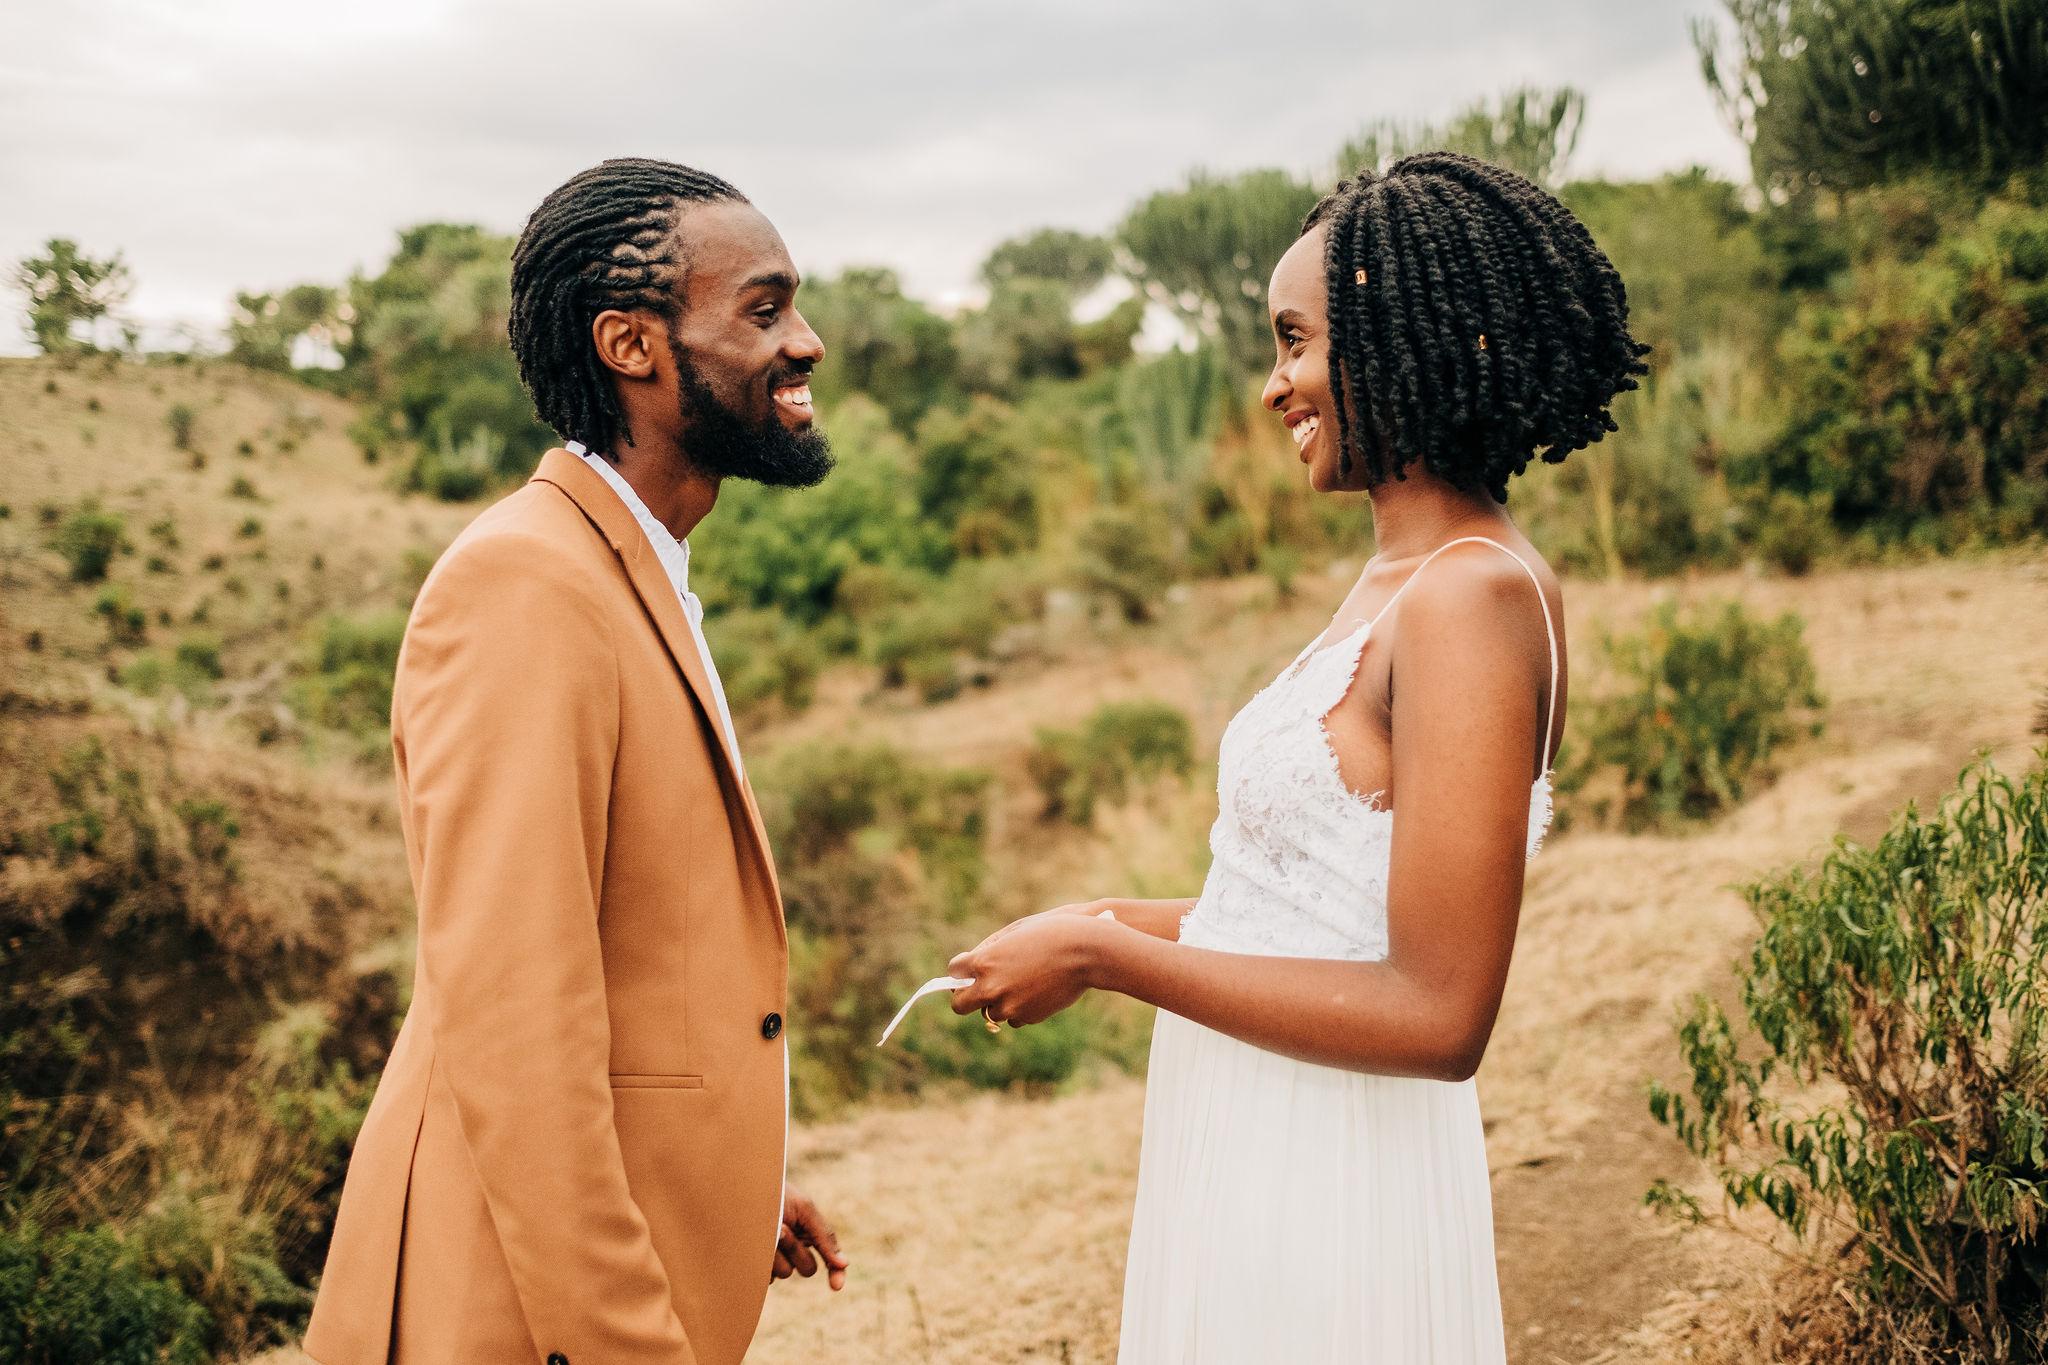 Anna-Hari-Photography-Destination-Wedding-Photographer-Kenya-135.jpg